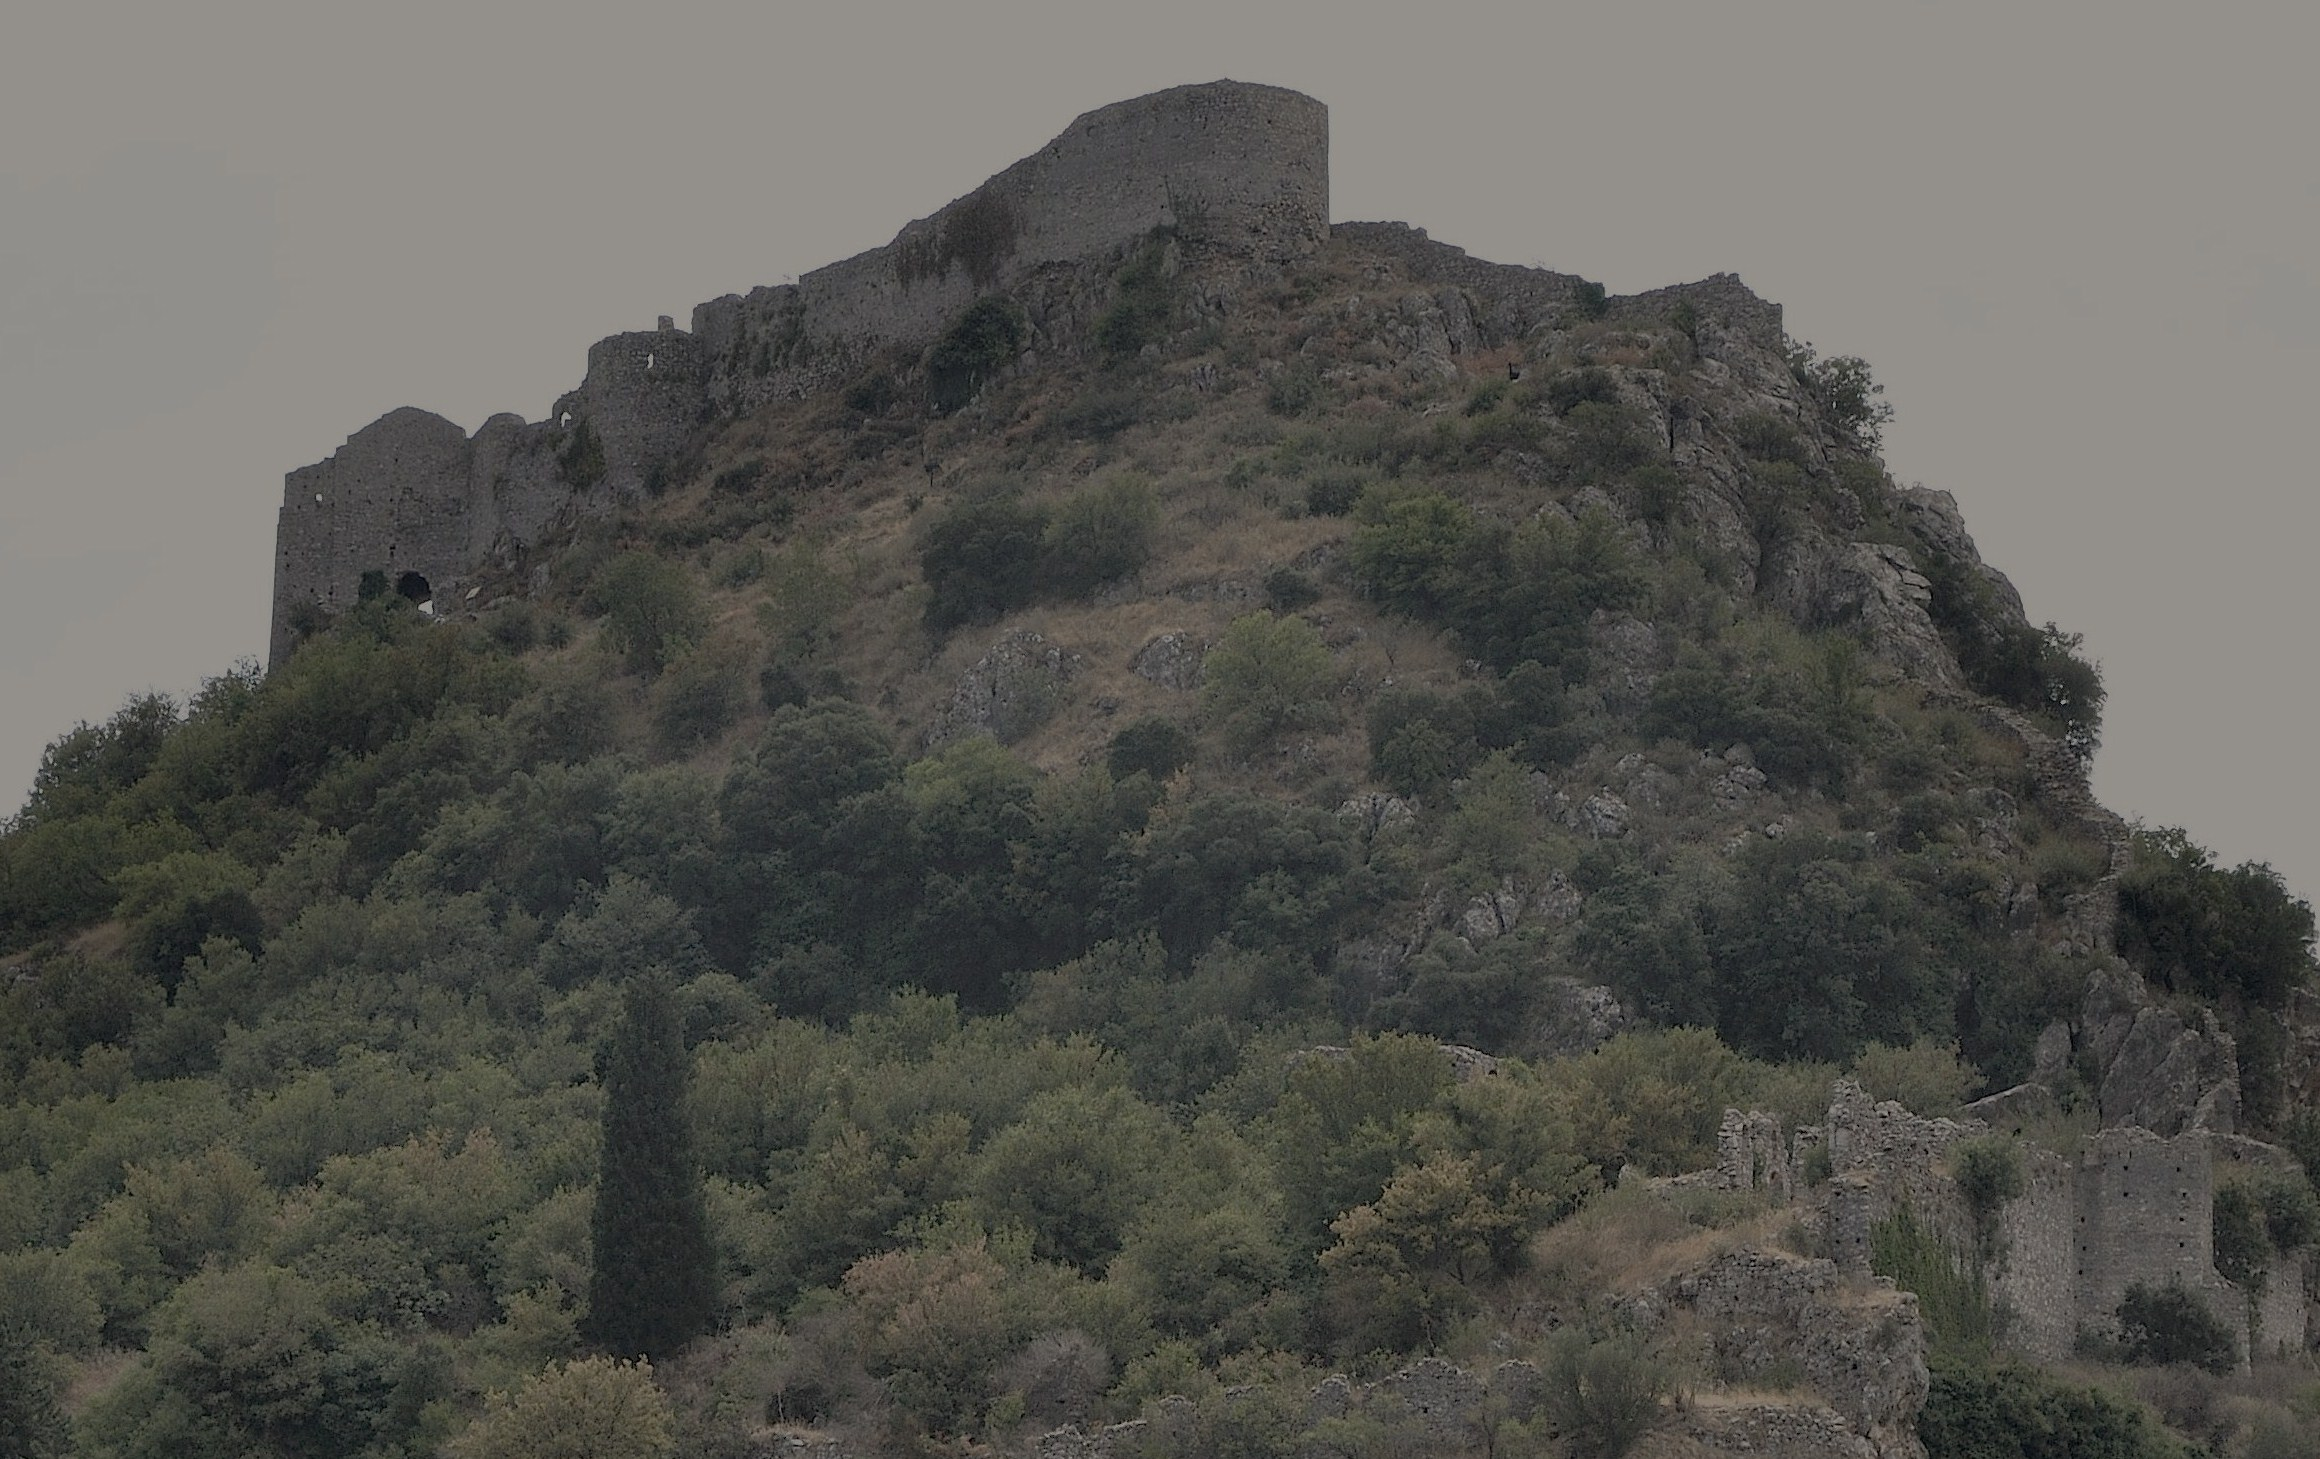 Ruined citadel